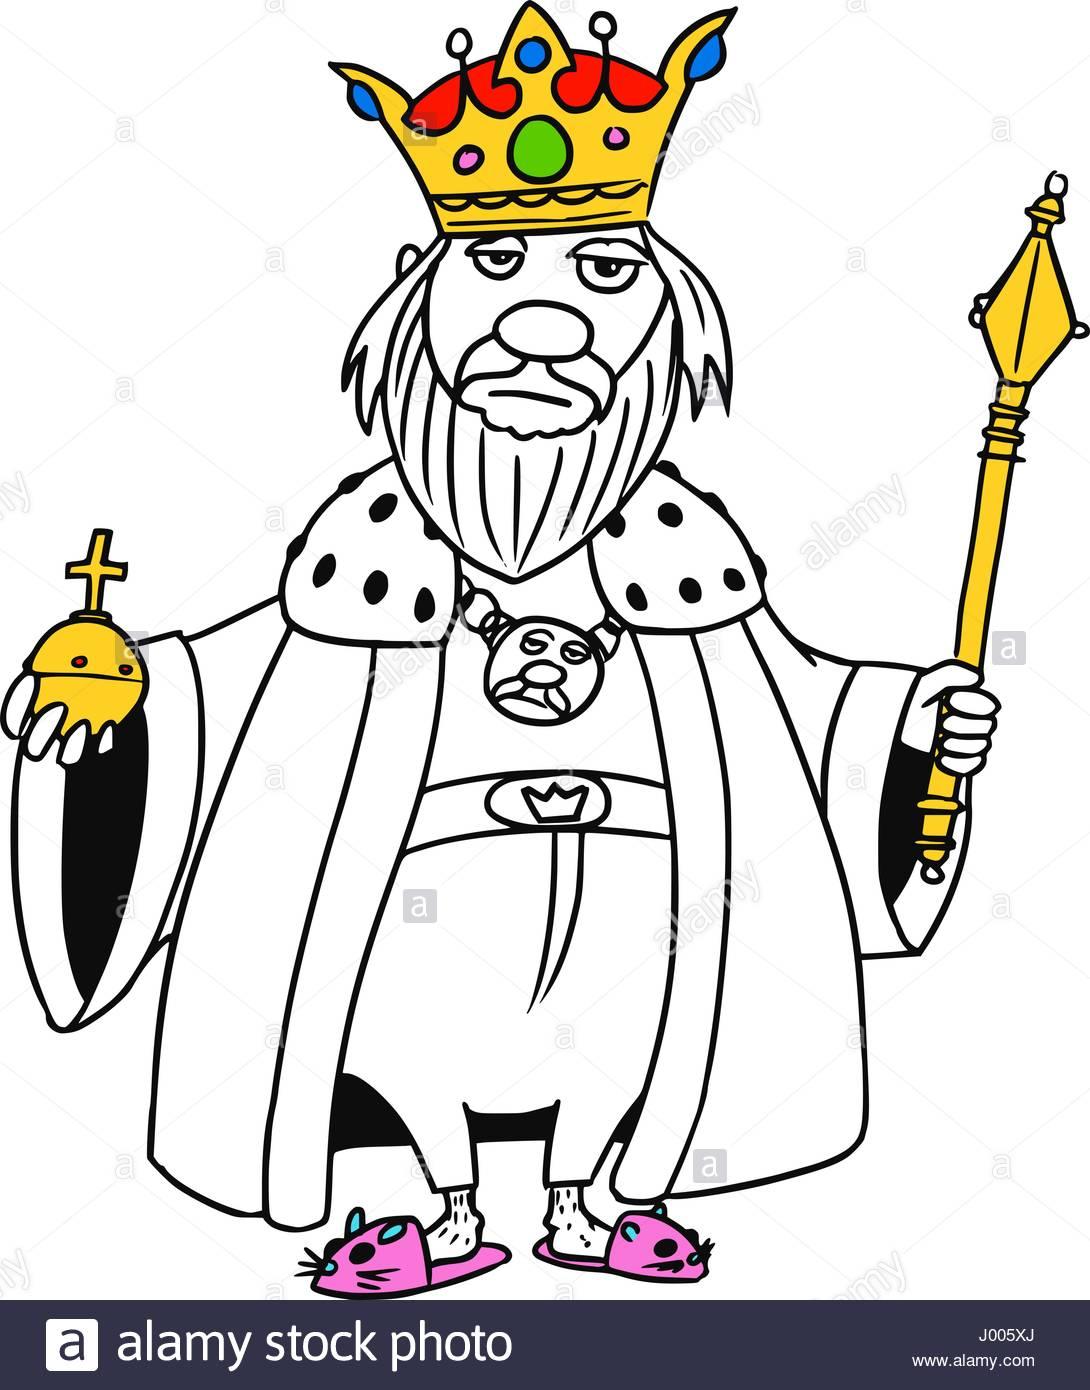 1090x1390 Cartoon Vector Old Fantasy Medieval King Monarch Sovereign